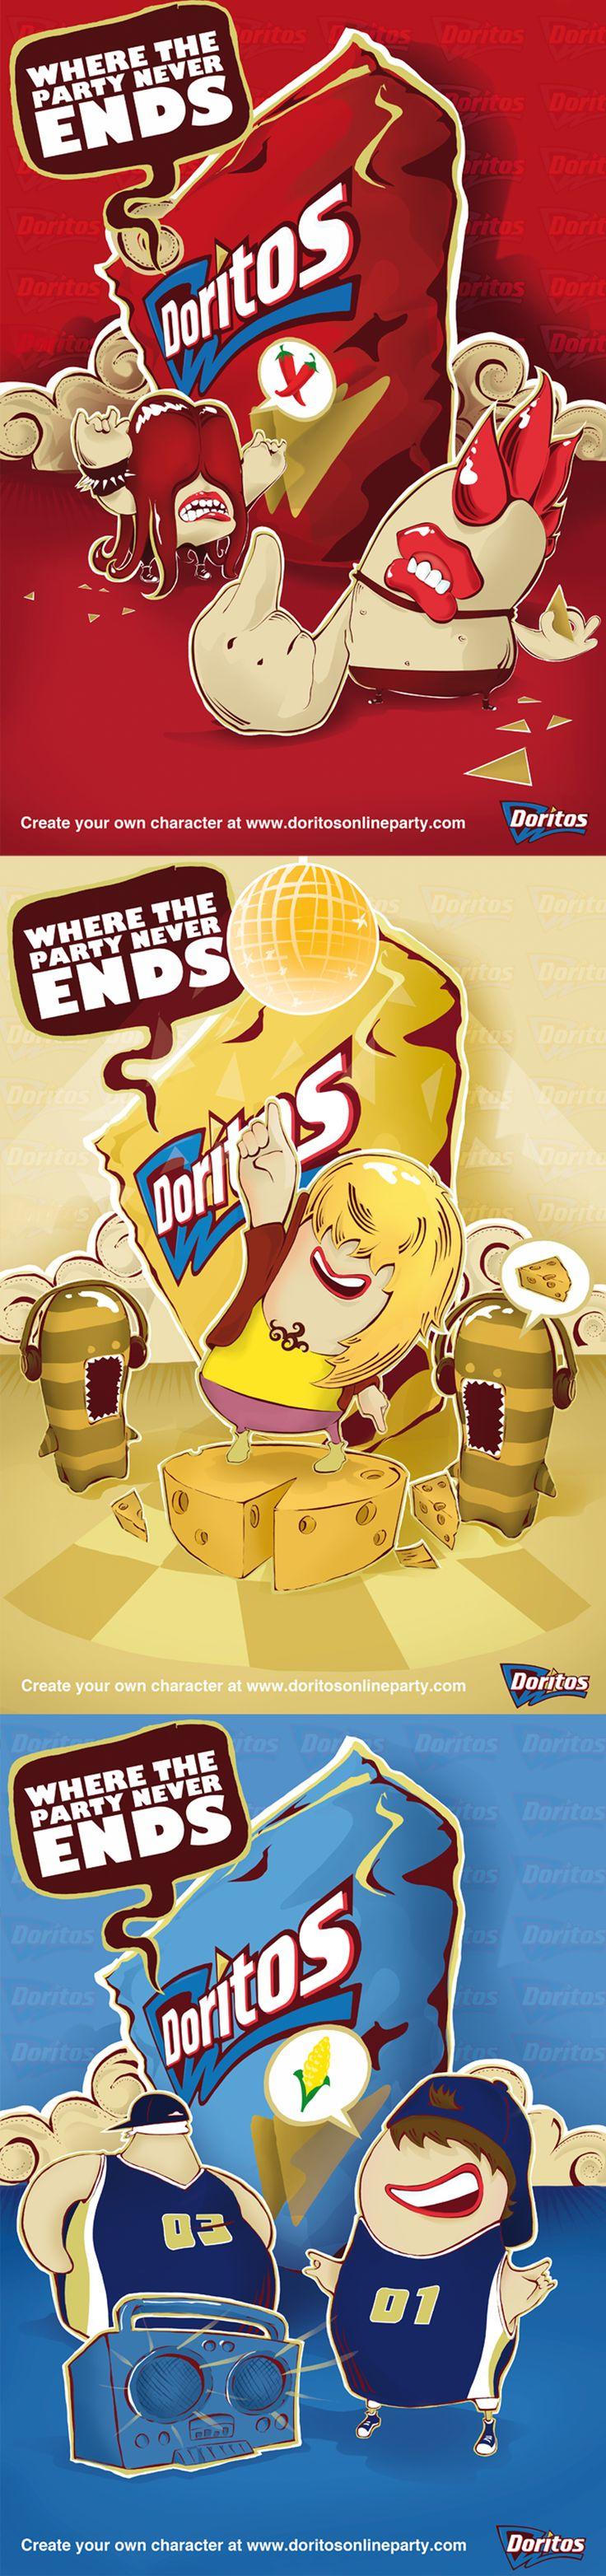 "Come check out ""Doritos"" Illustration advertisement by Emblem - illustration by Jeffrey Furlong"